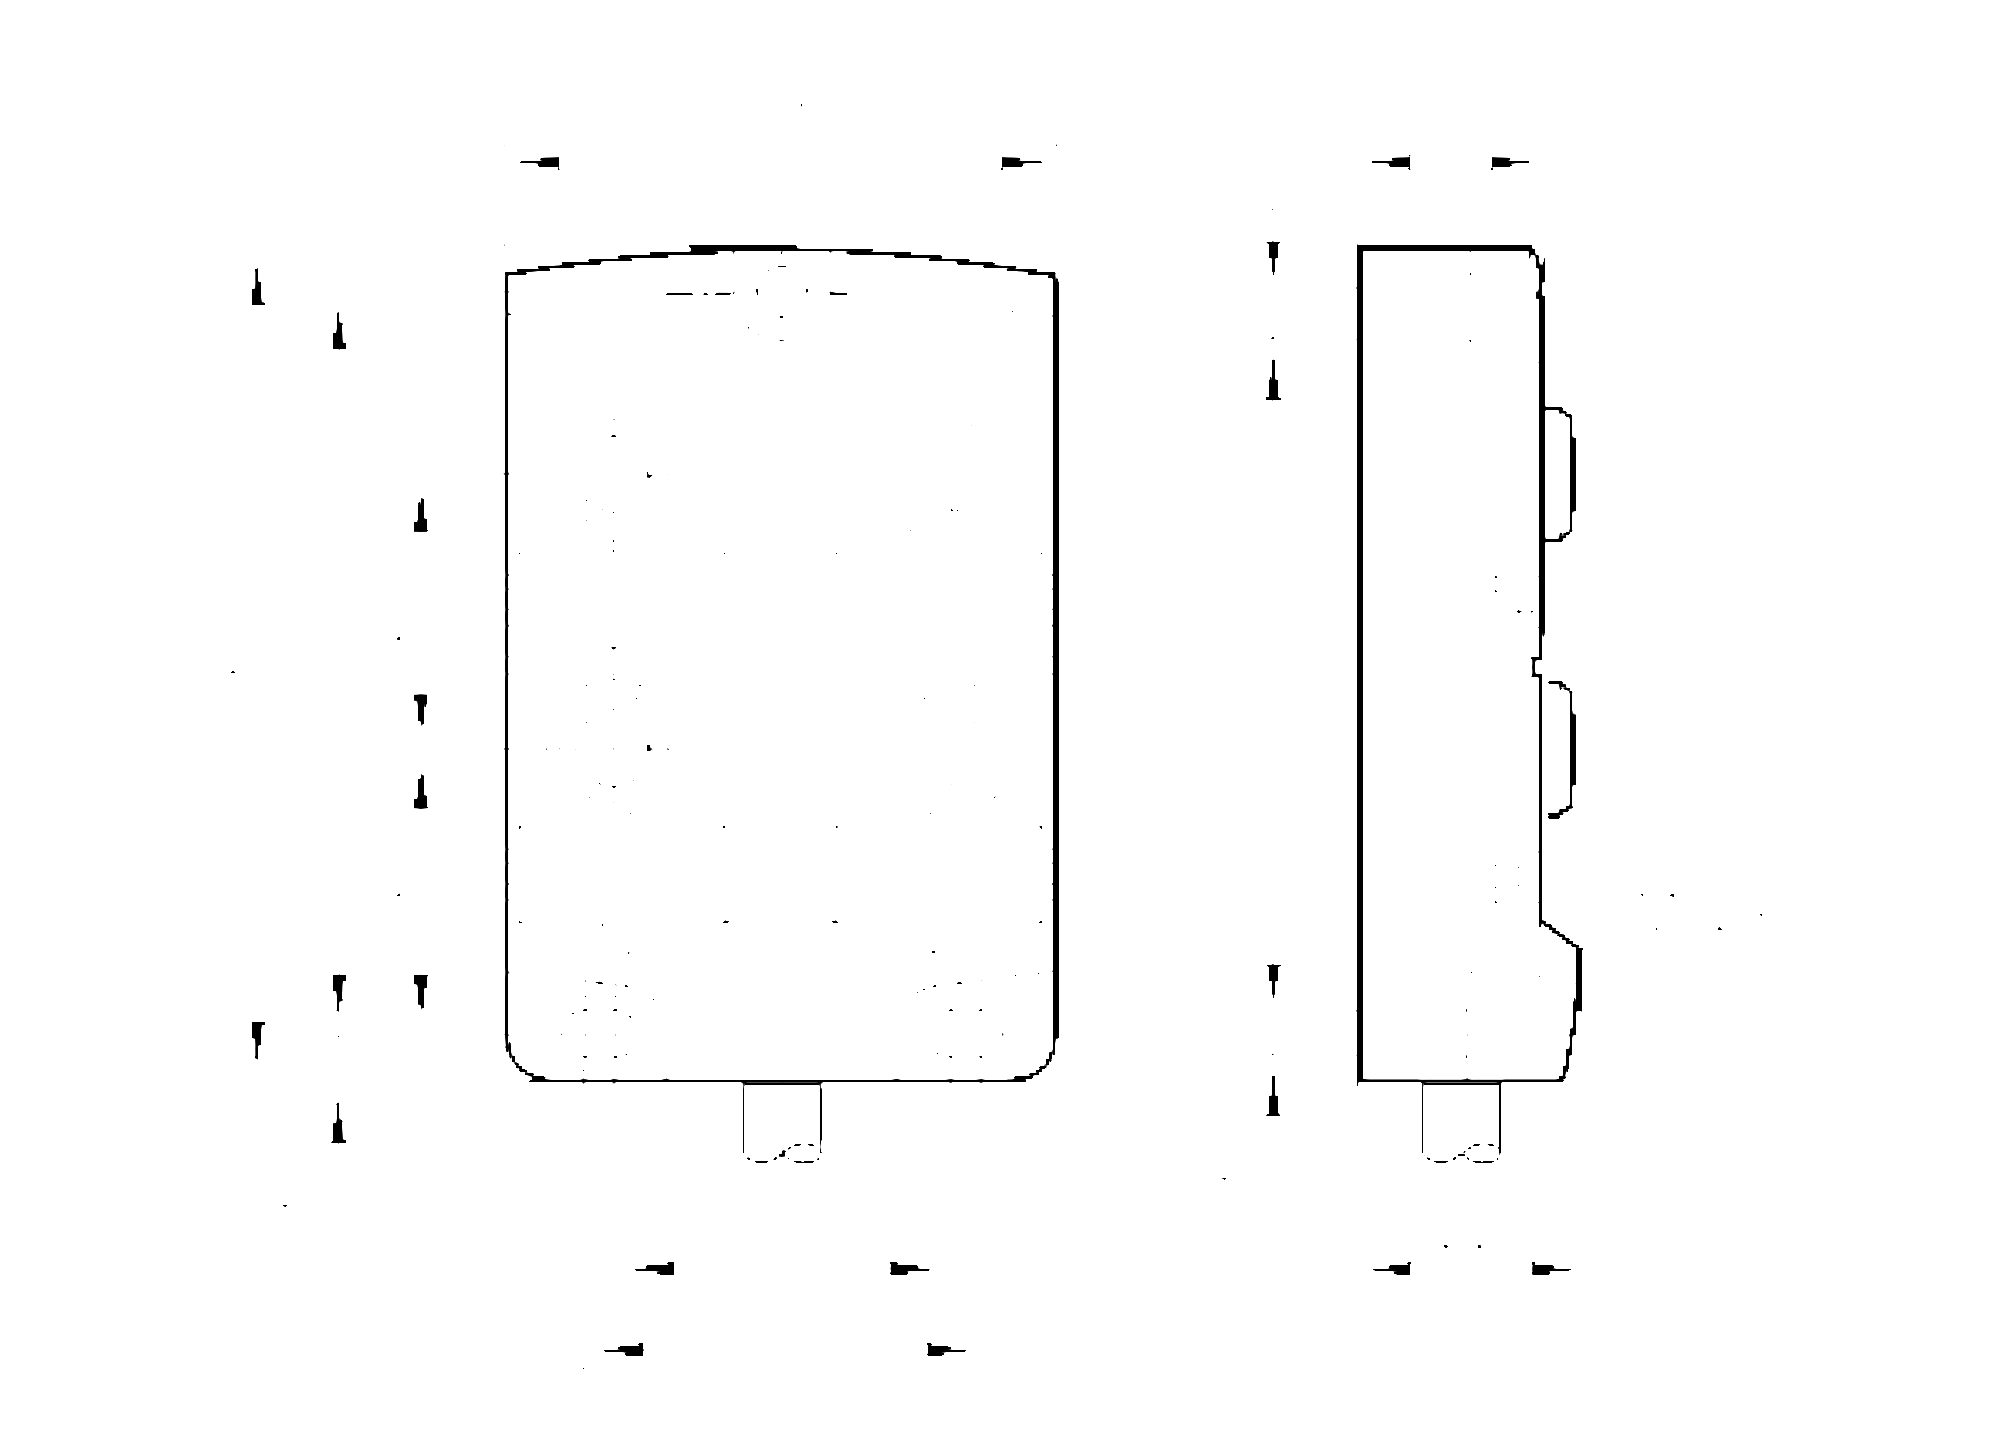 ebc013 - wiring block